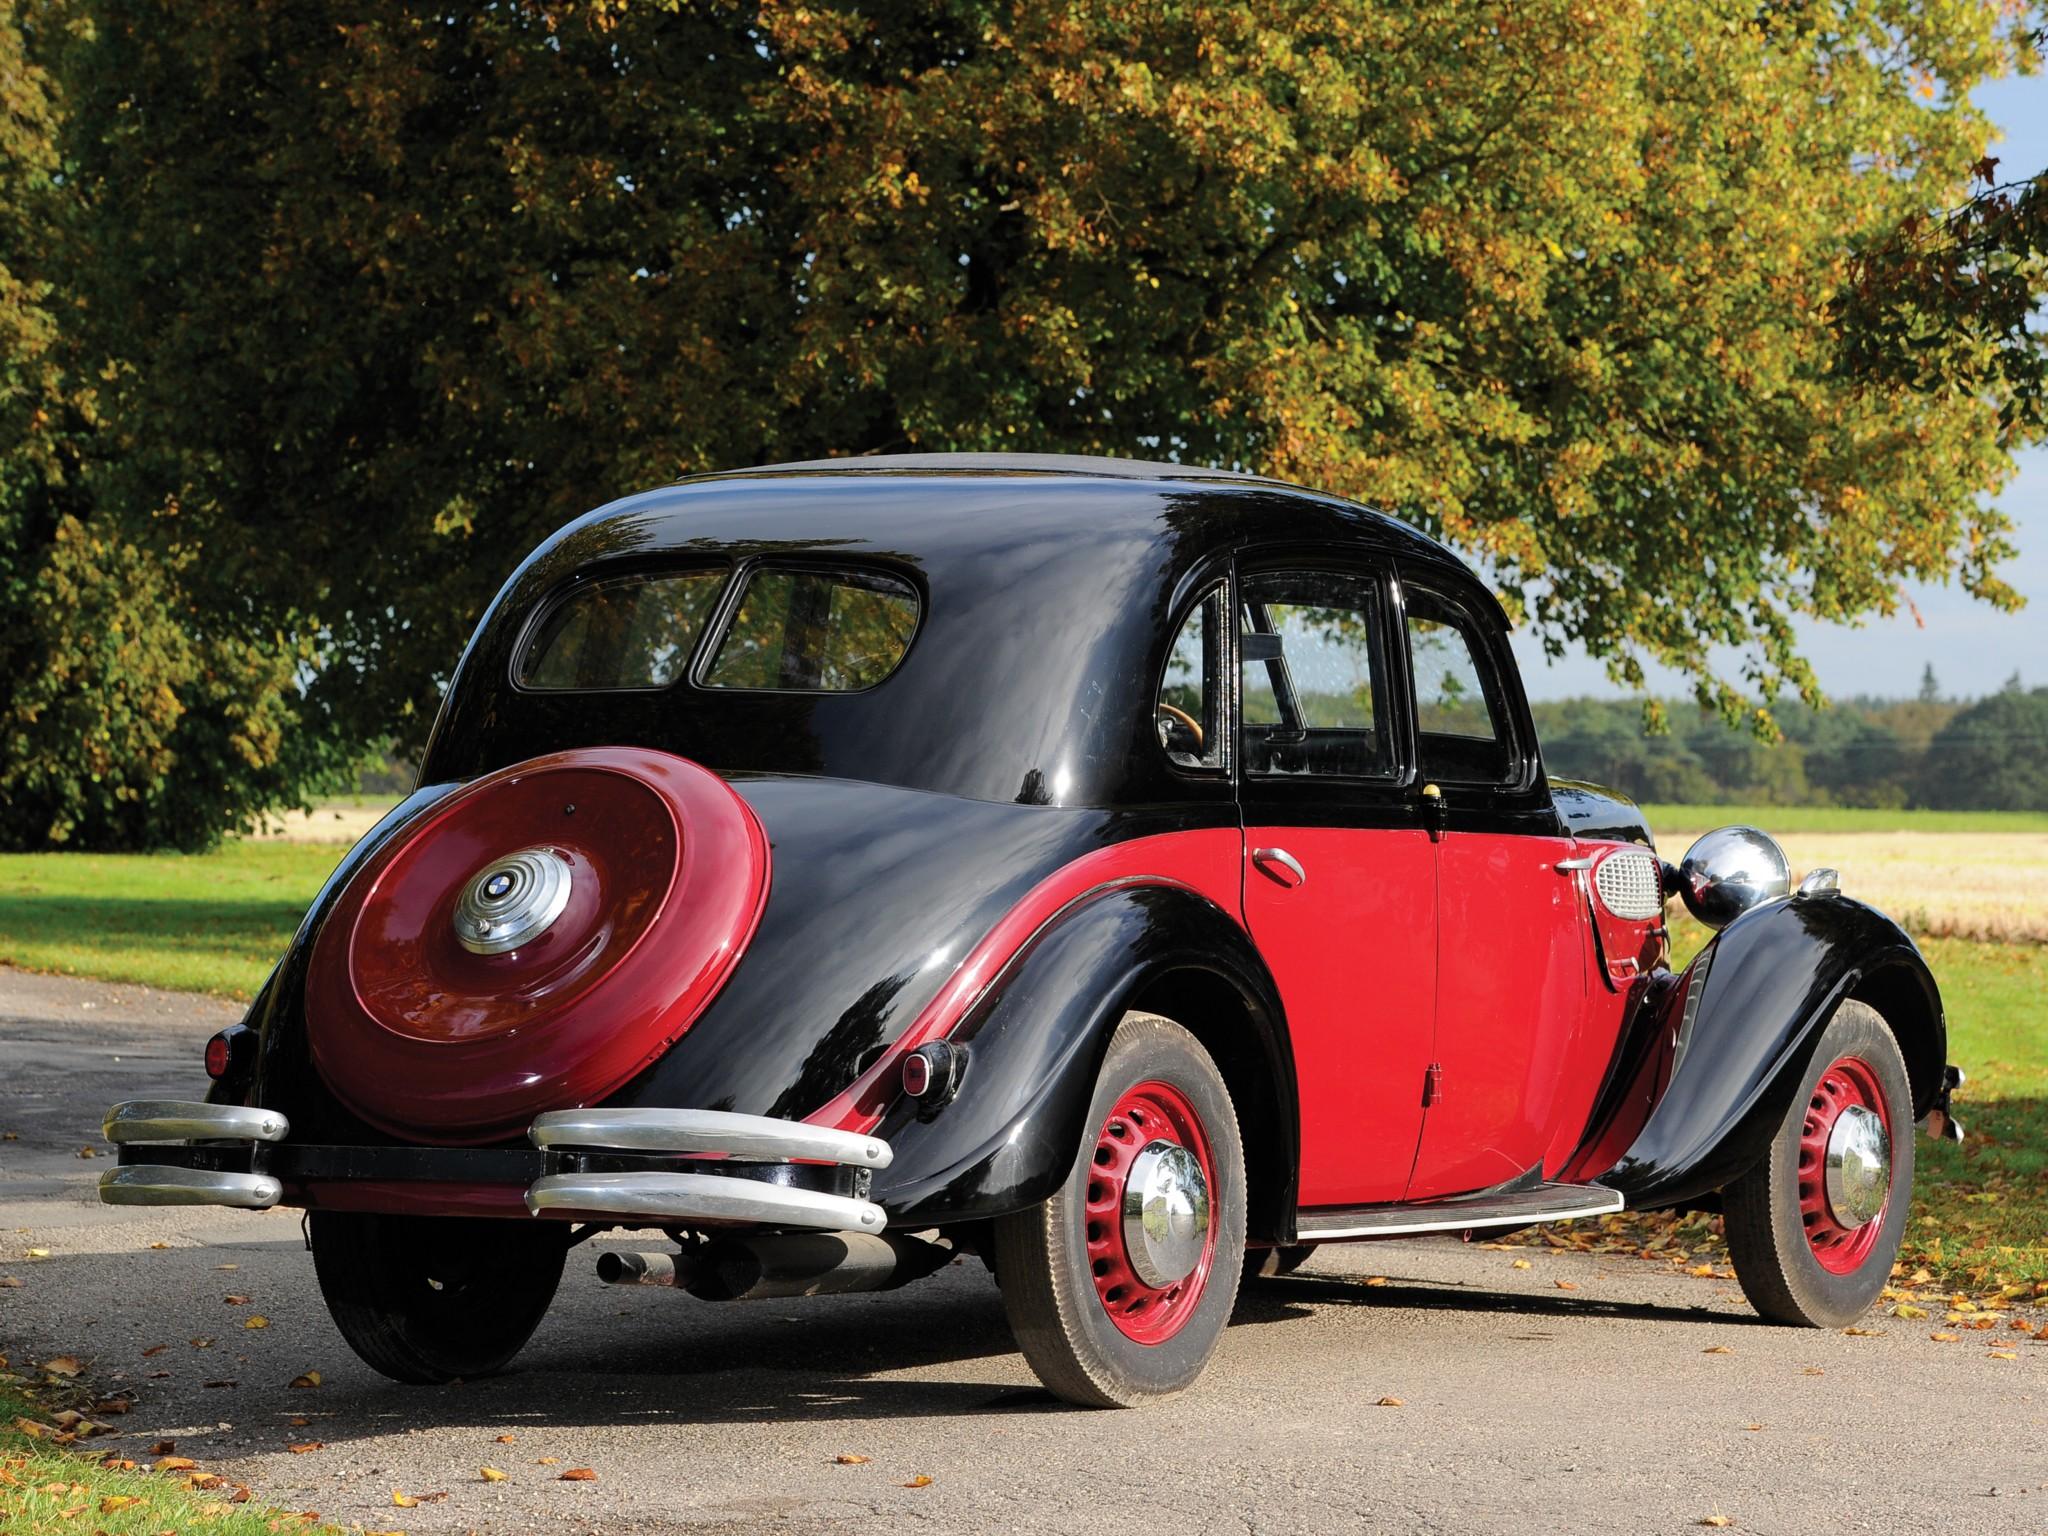 BMW 326 - 1936, 1937, 1938, 1939, 1940, 1941 - autoevolution